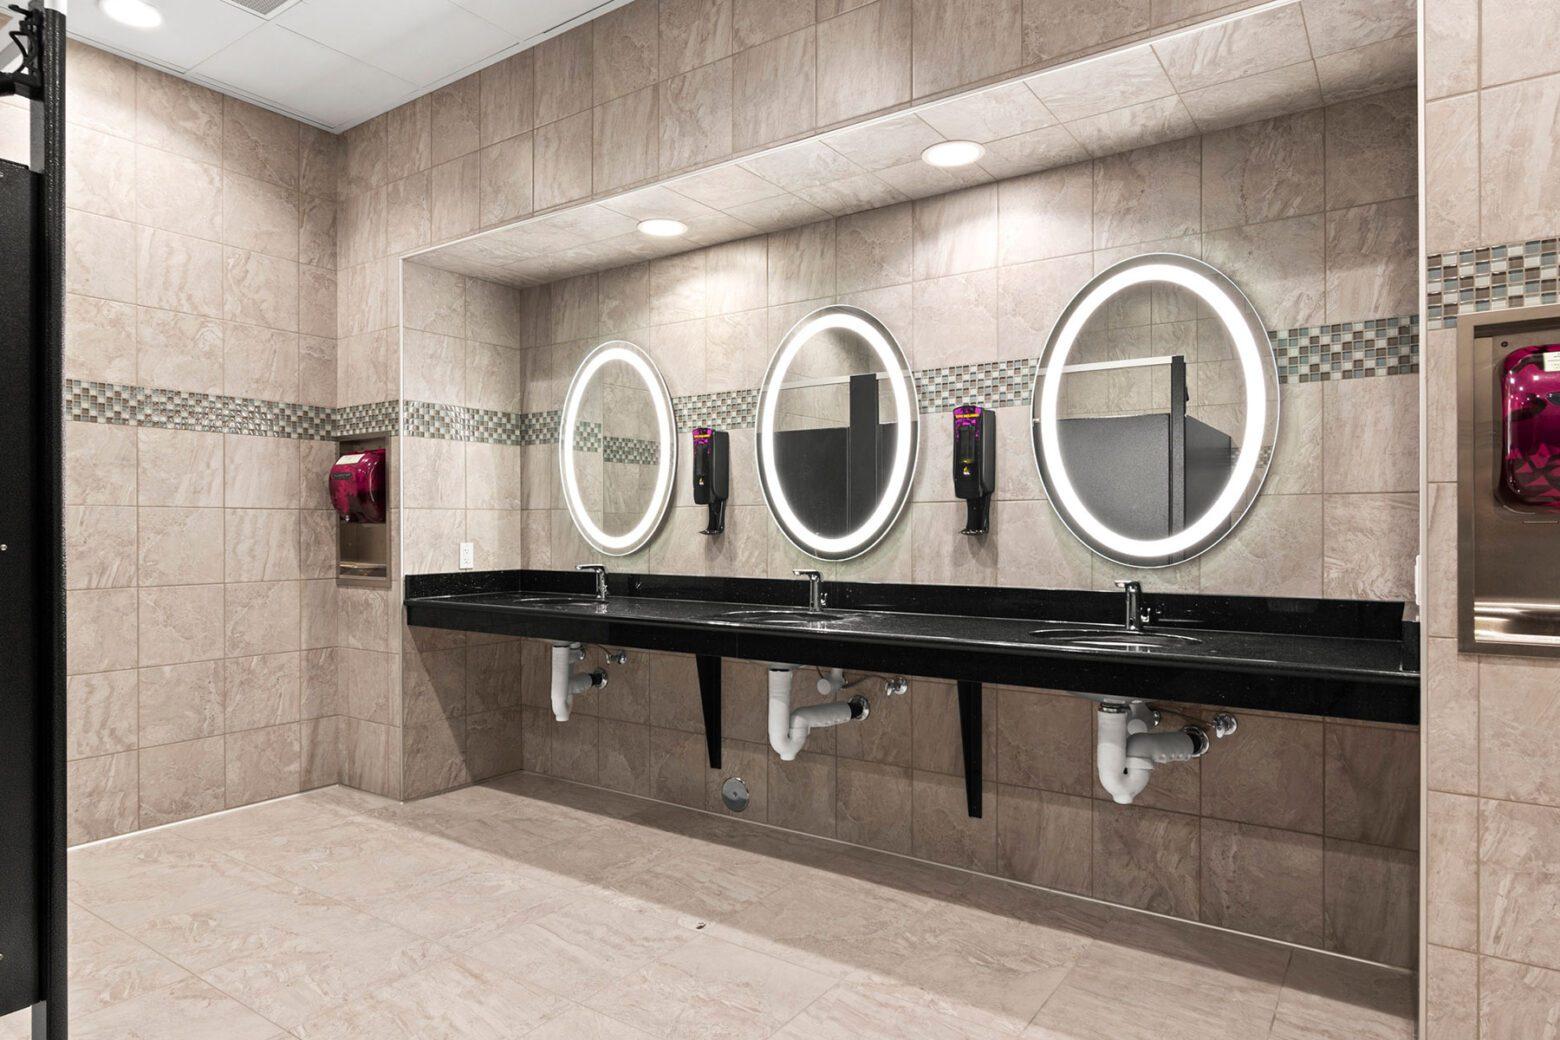 Planet Fitness San Pablo bathroom